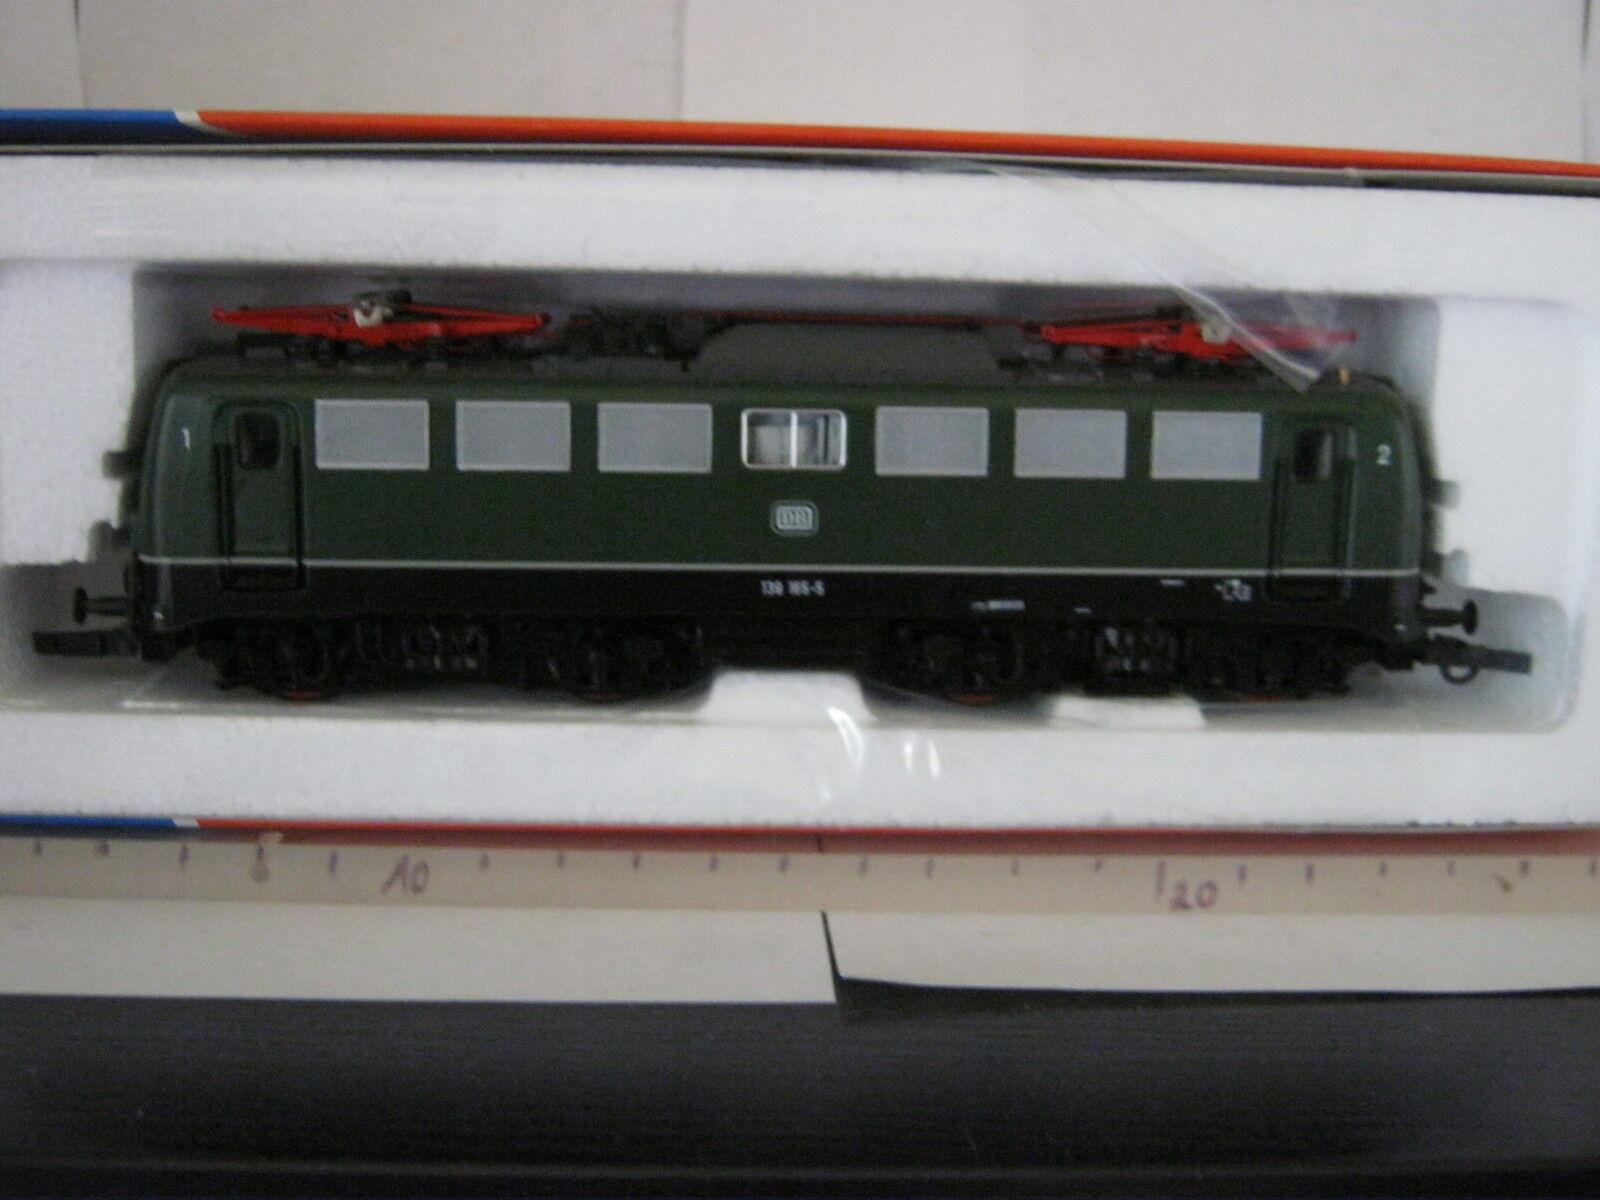 Roco HO 43383 Elektro Lok Lok Lok BtrNr 139 165-5 DB (RG BQ 132-73S7F2)  | Online einkaufen  528923